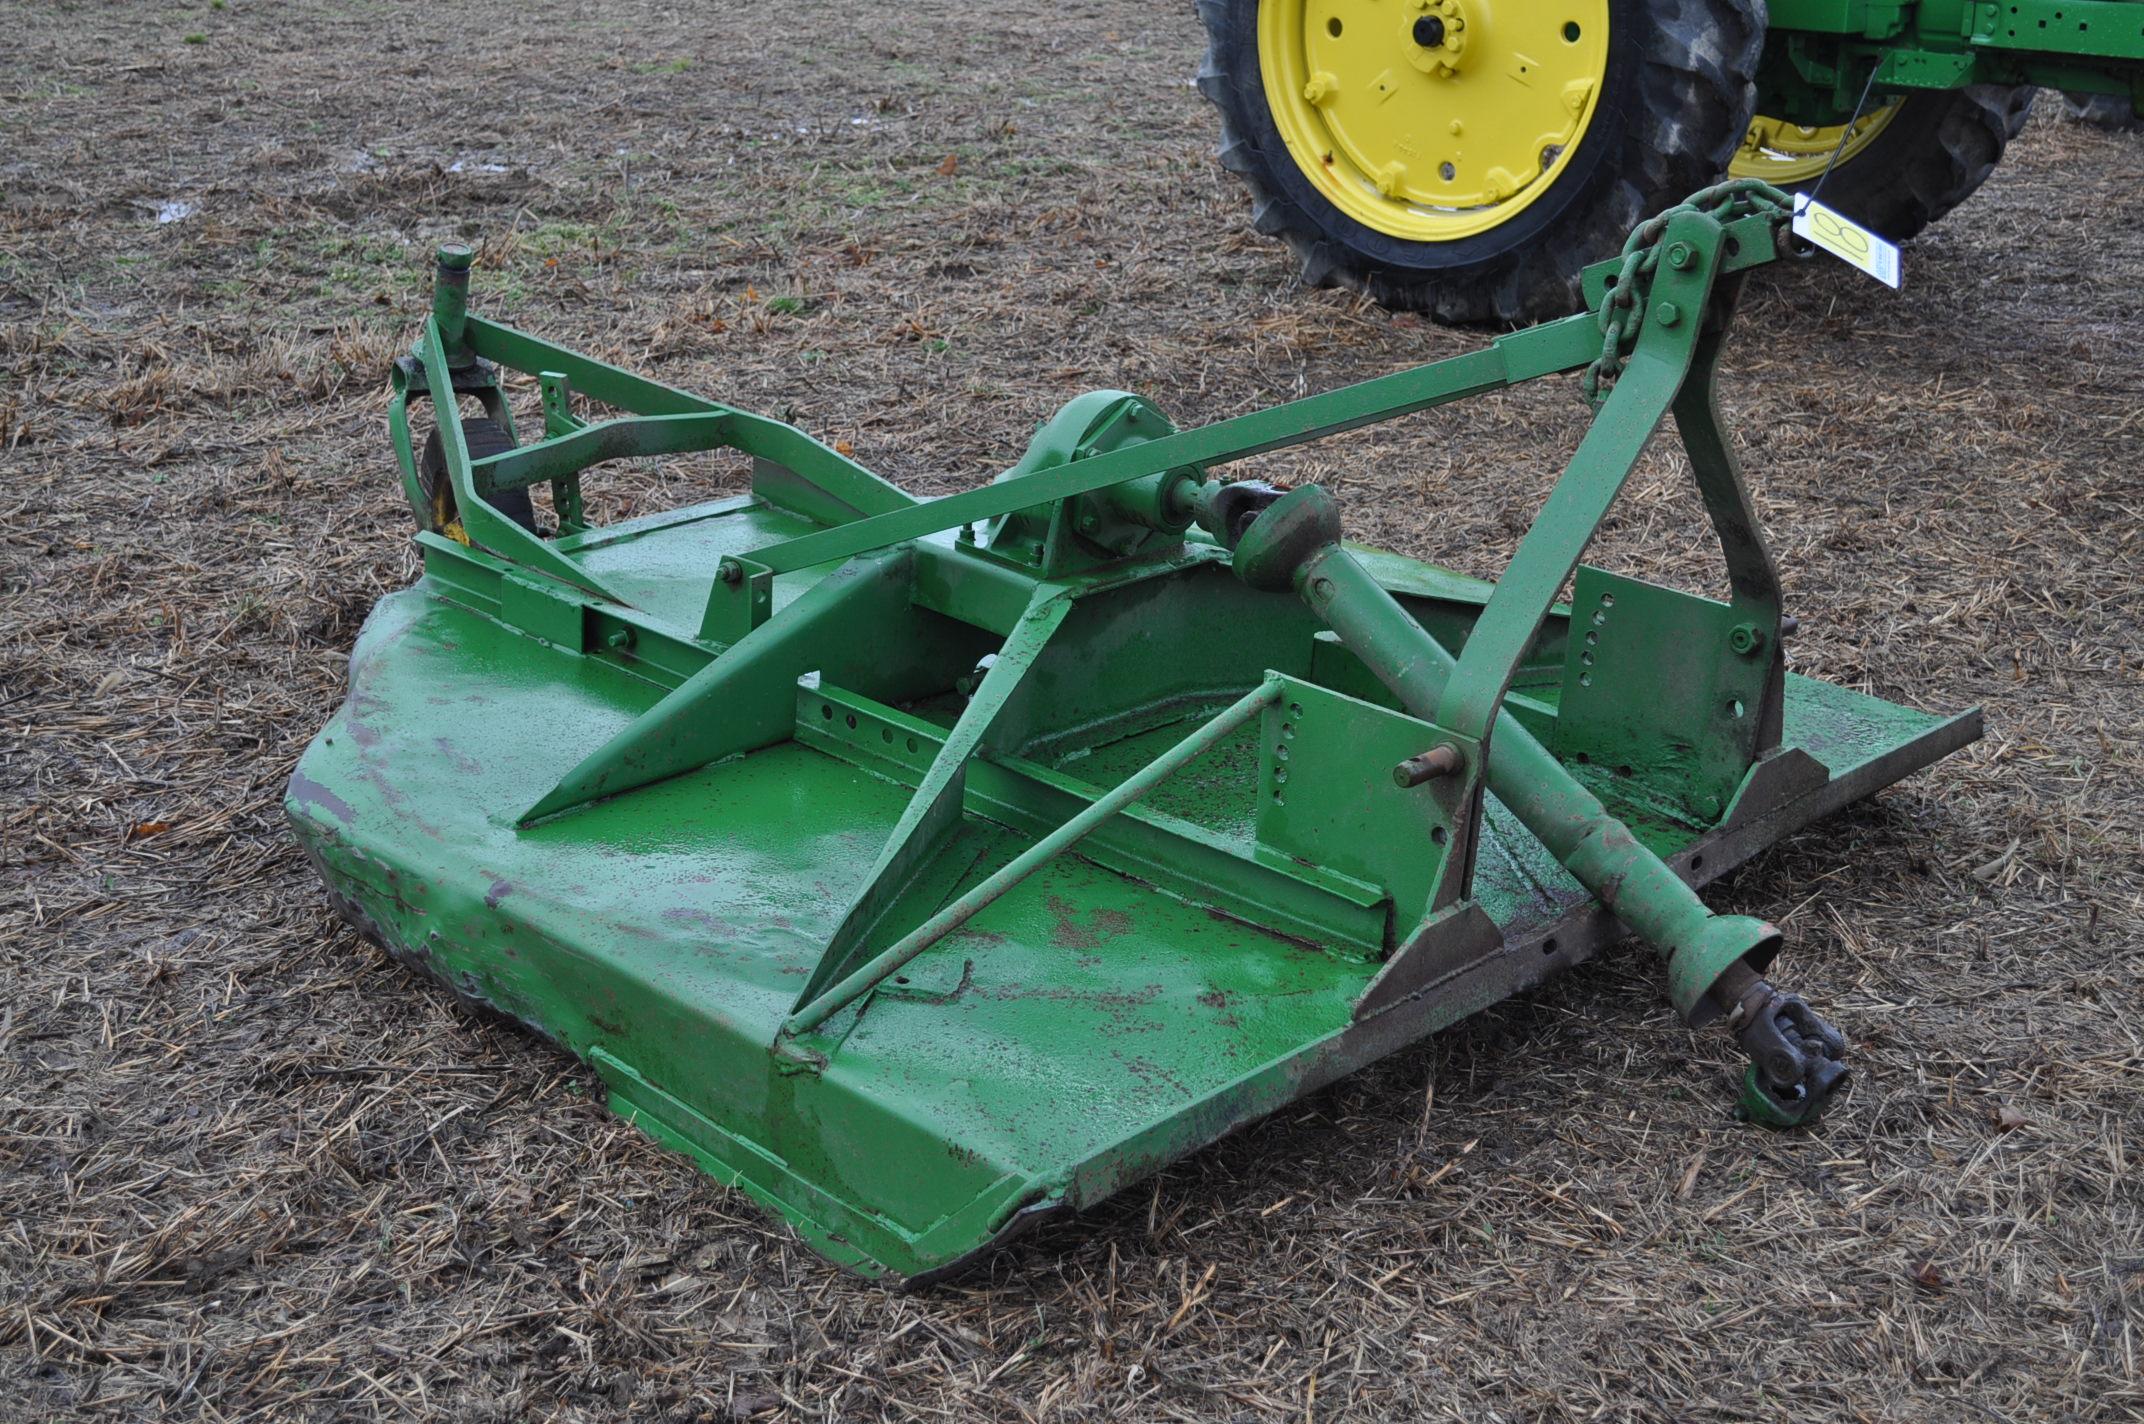 6' John Deere 3pt. rotary mower - Image 4 of 7